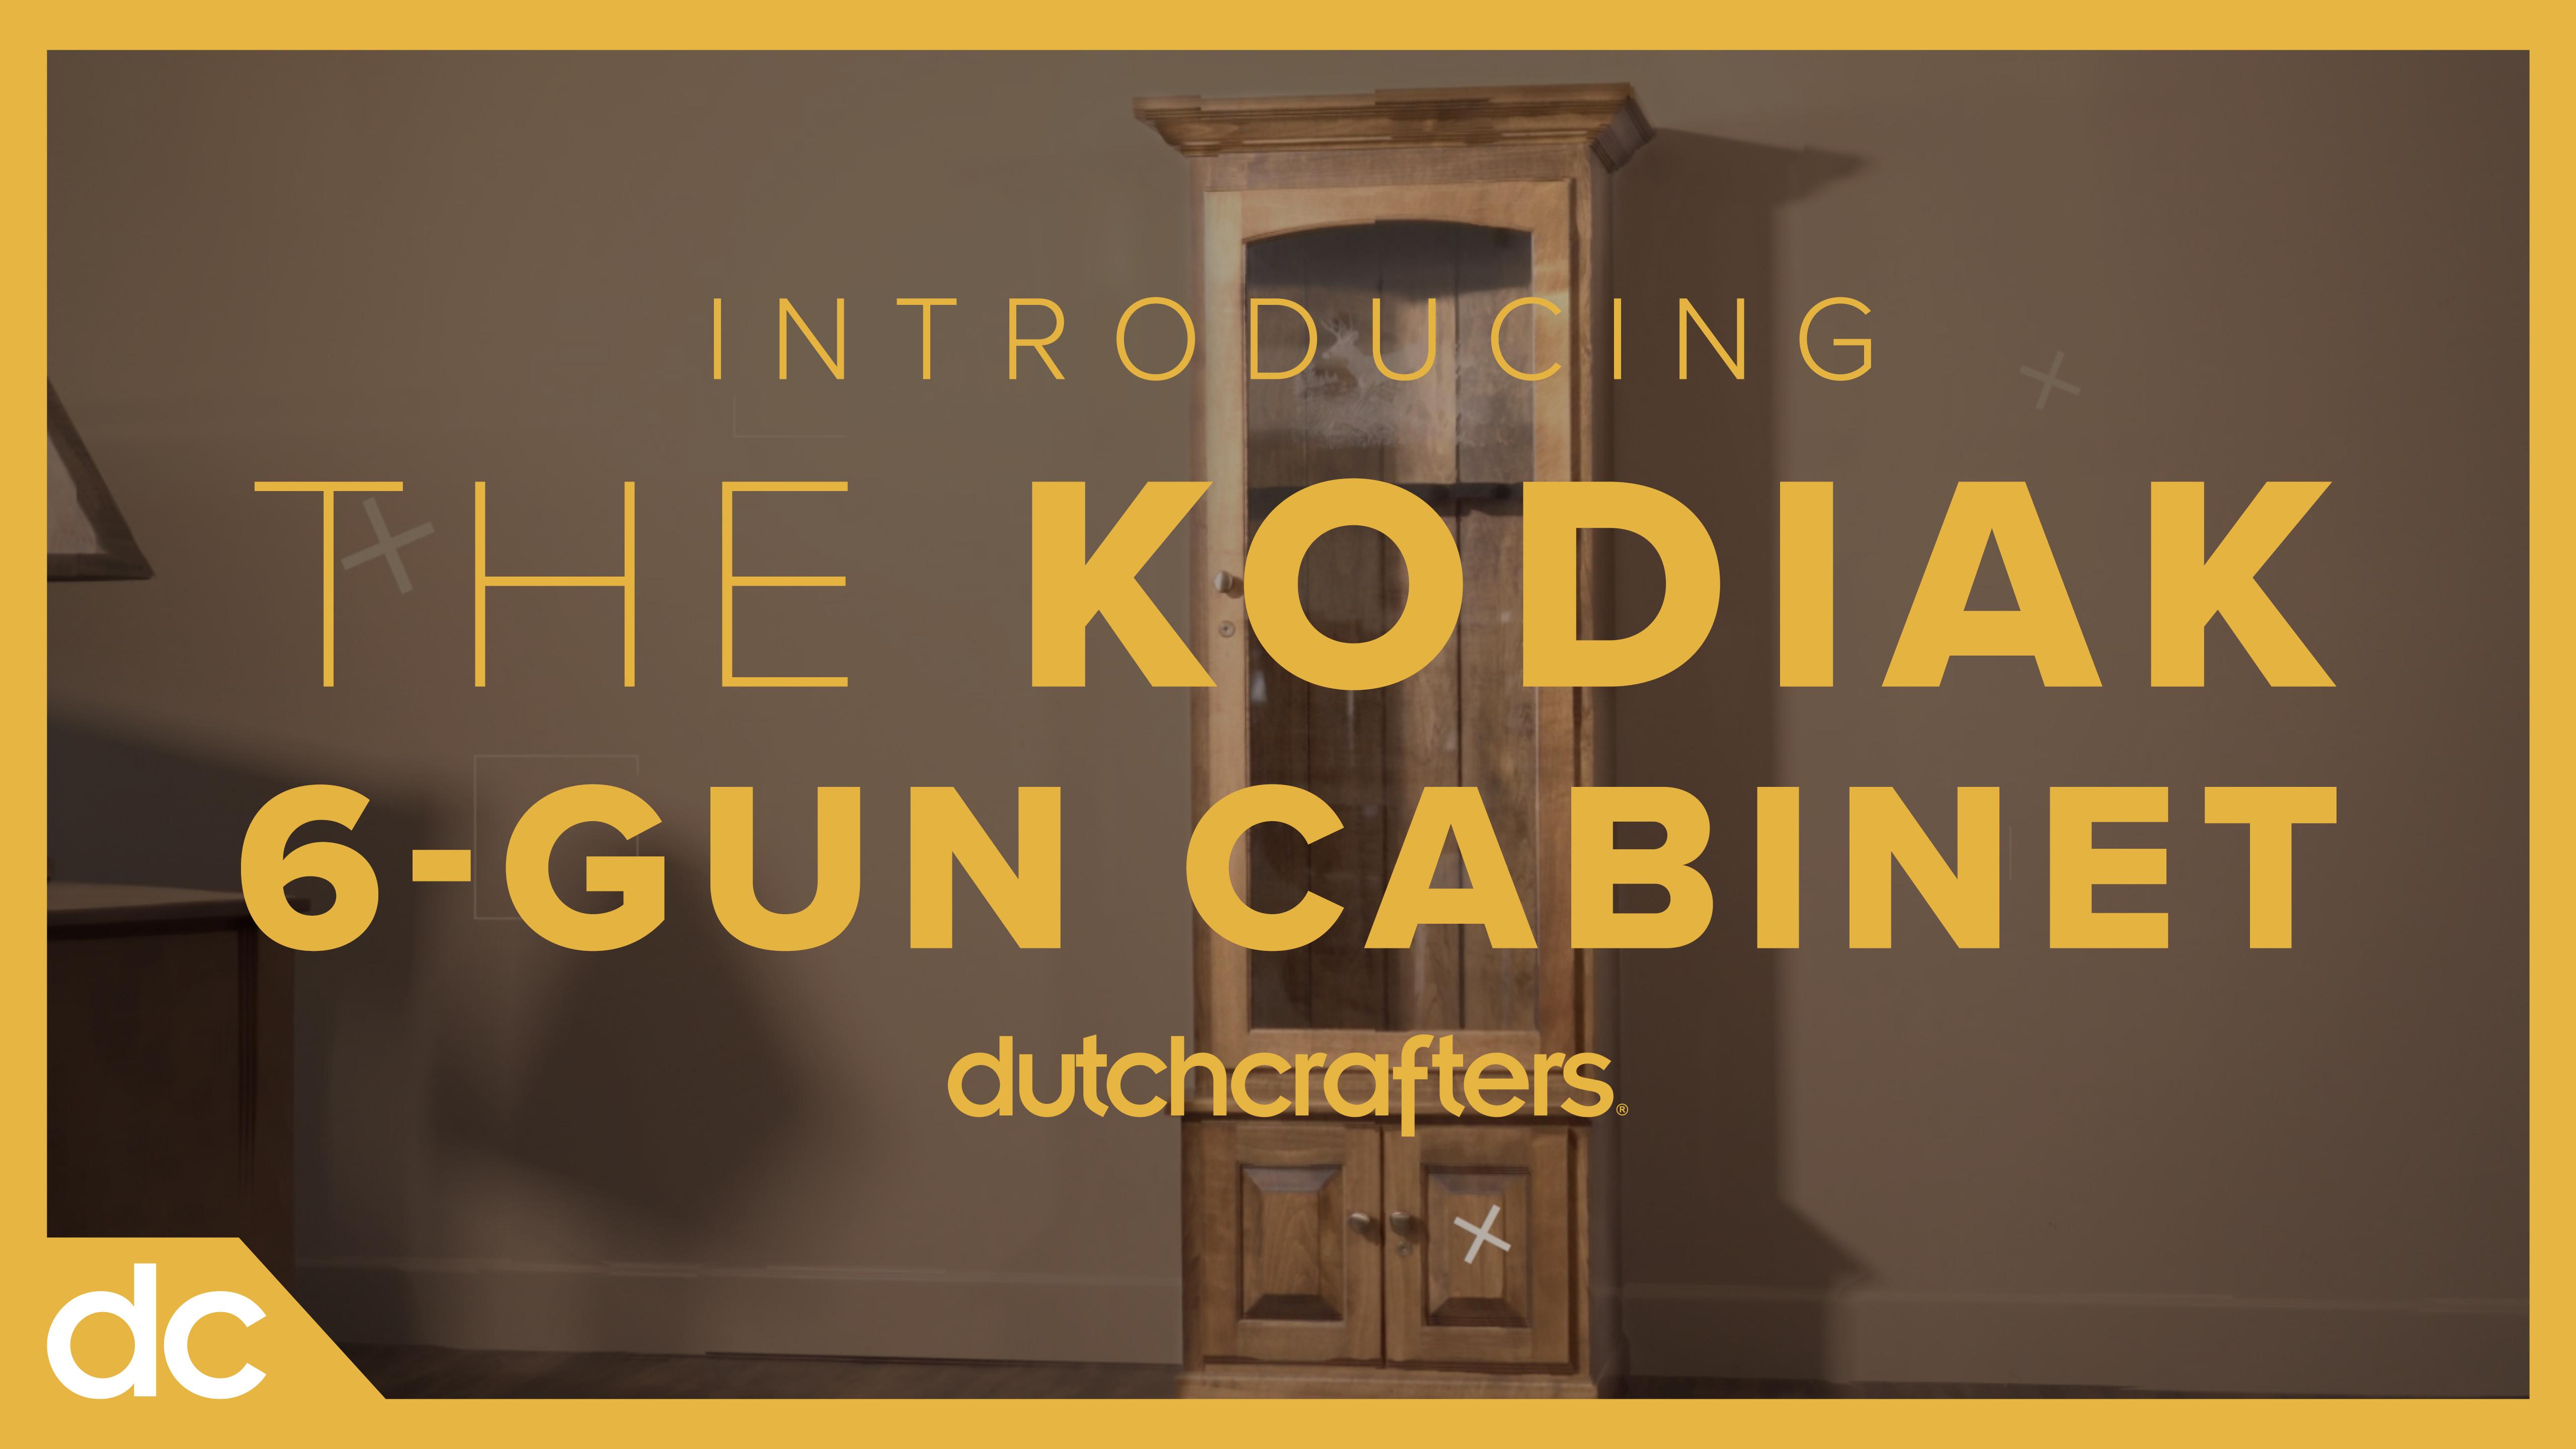 Introducing the Kodiak 6 Gun Cabinet at DutchCrafters